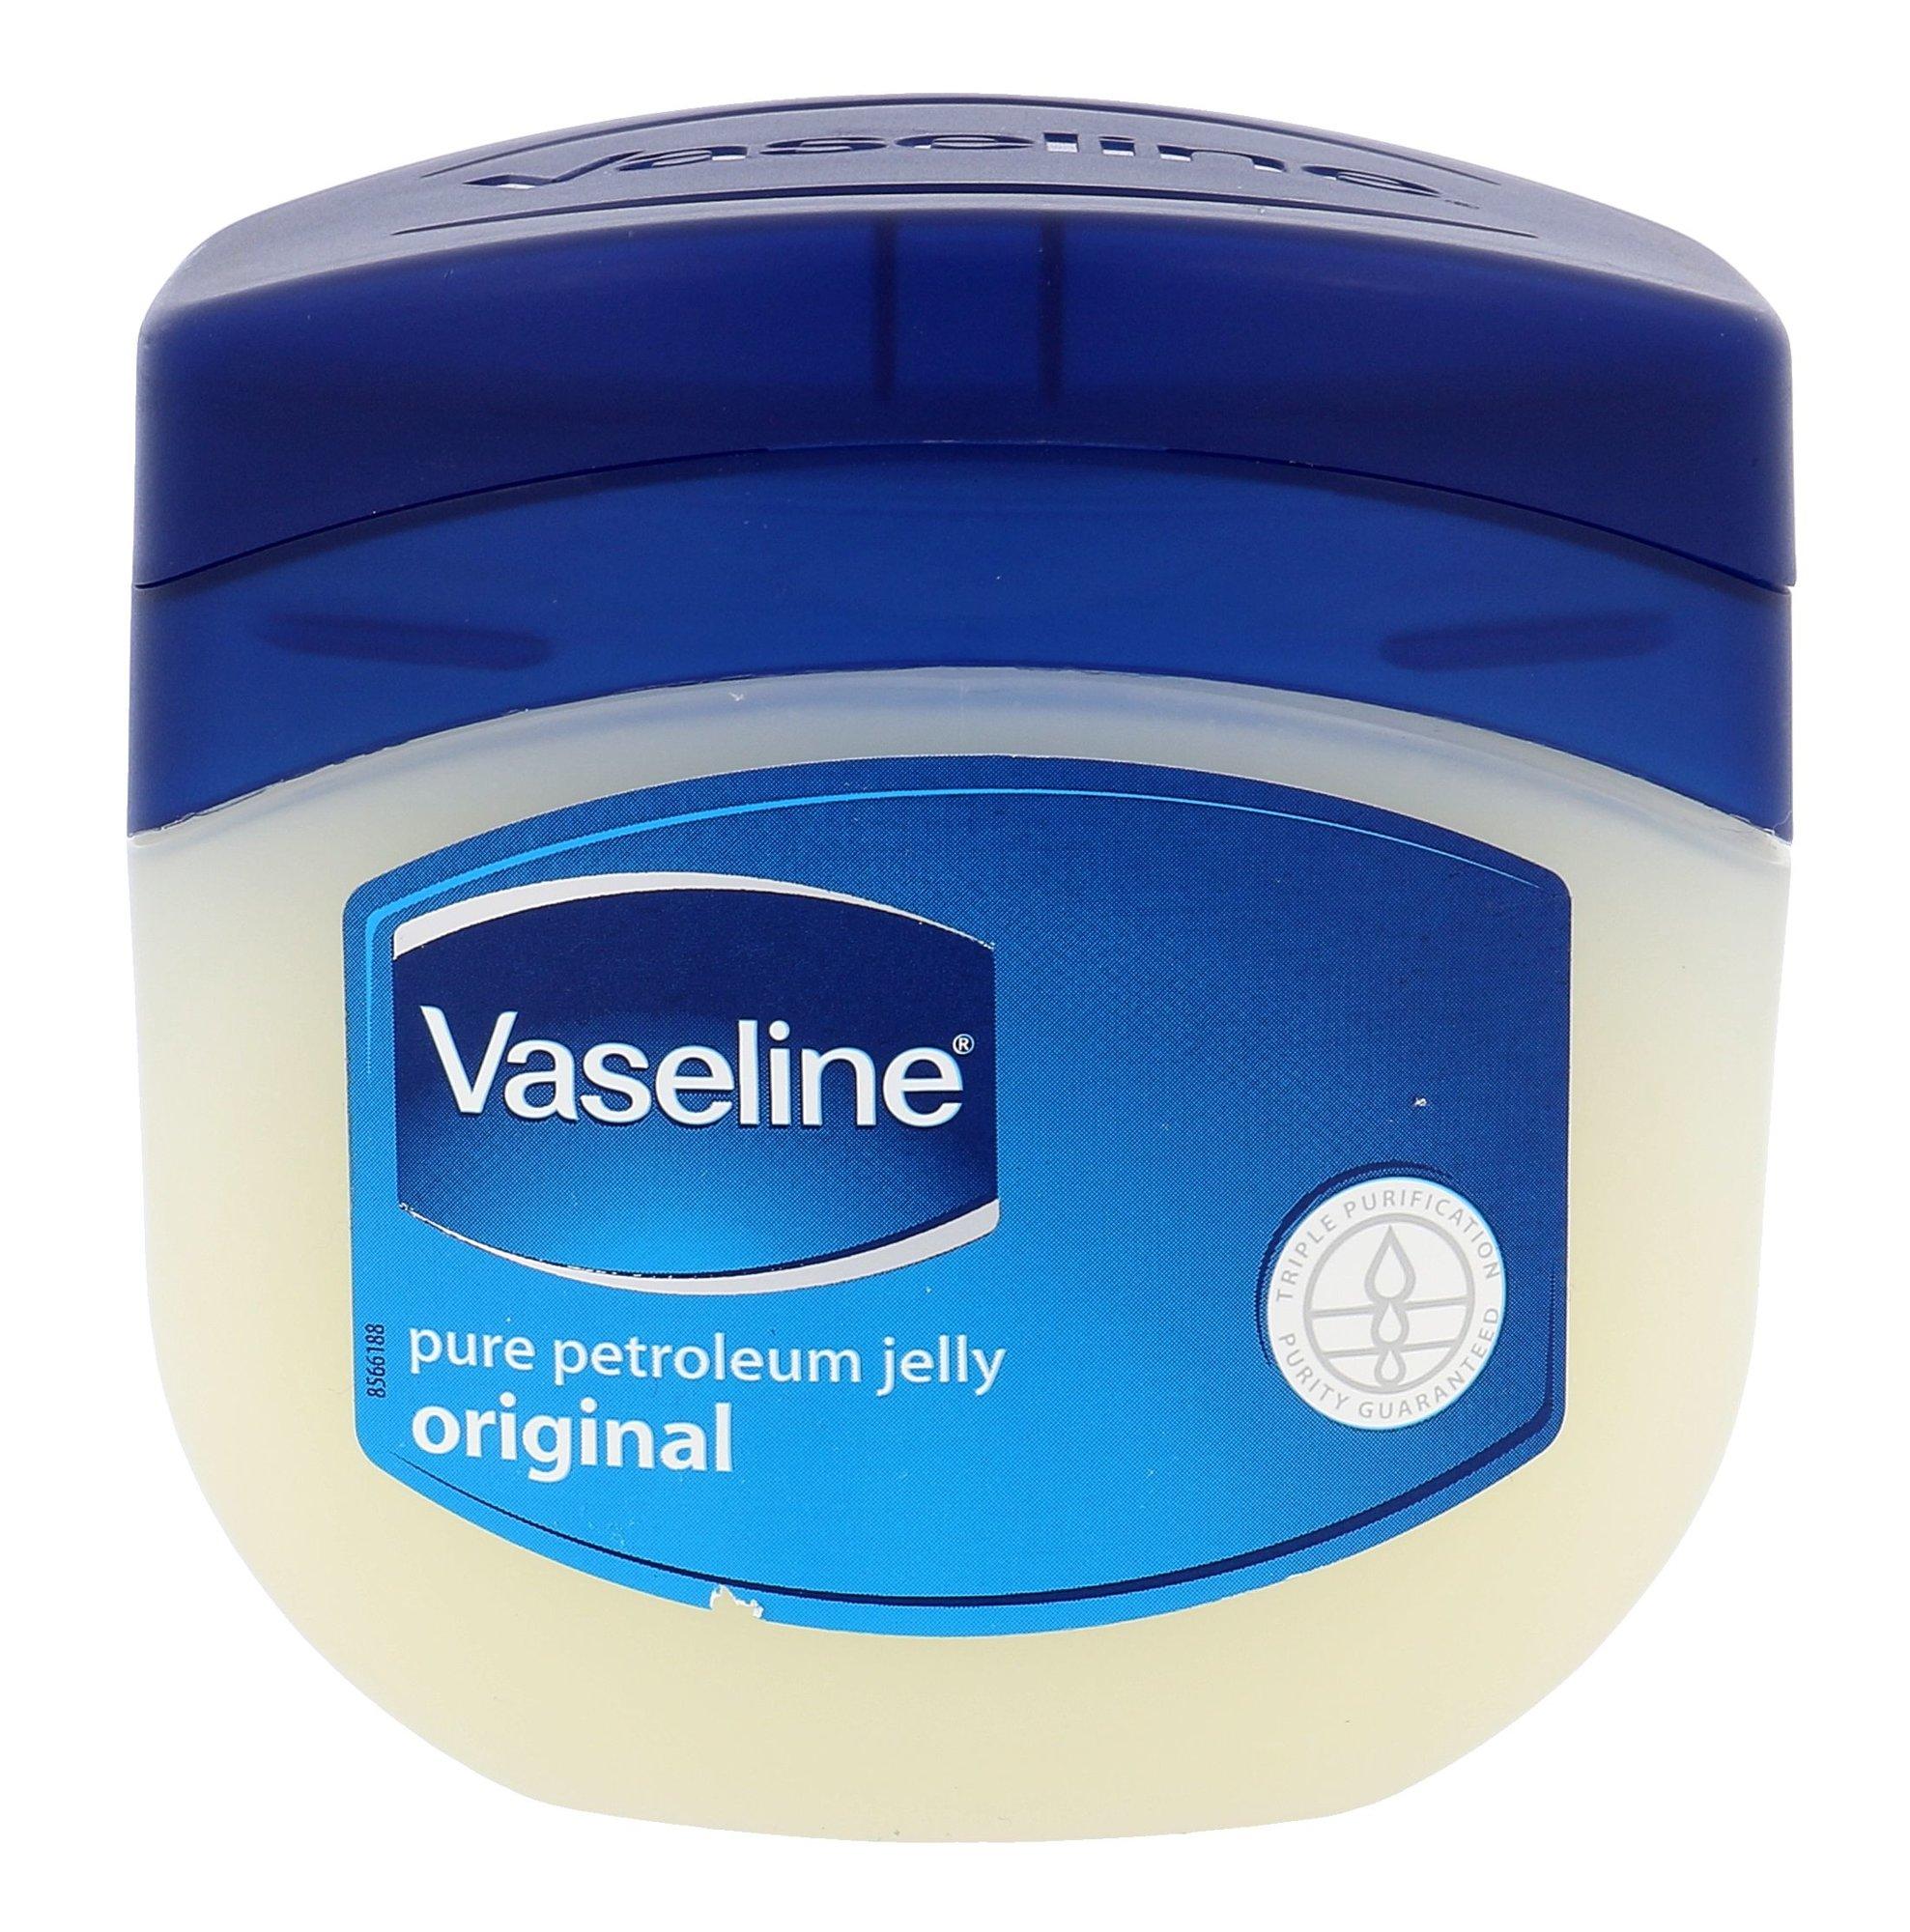 Vaseline Petroleum Jelly Original Cosmetic 250ml